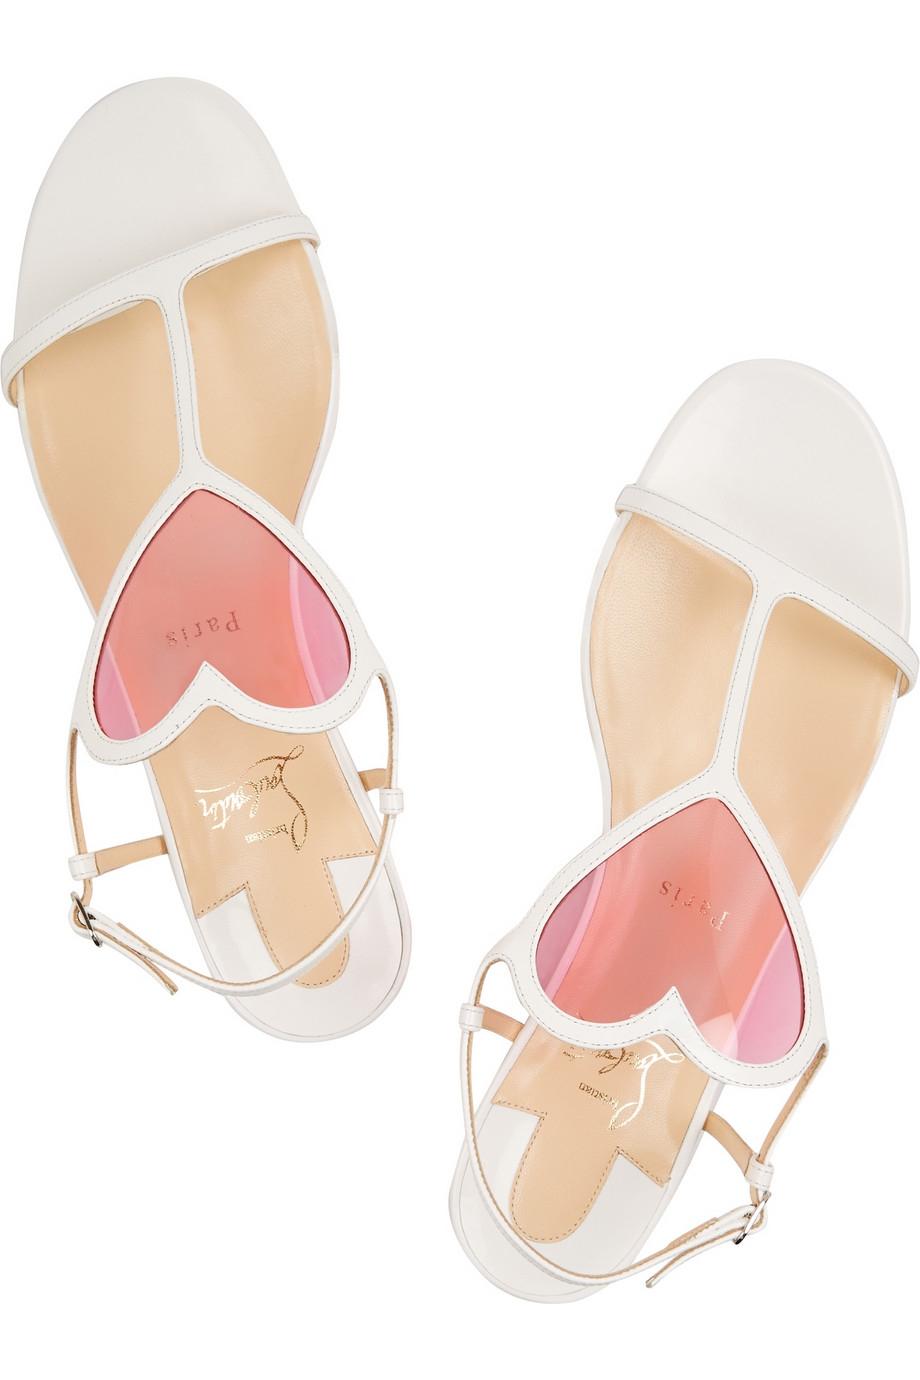 louboutin knock off - Shoeniverse: The Christian Louboutin flat shoes roundup featuring ...